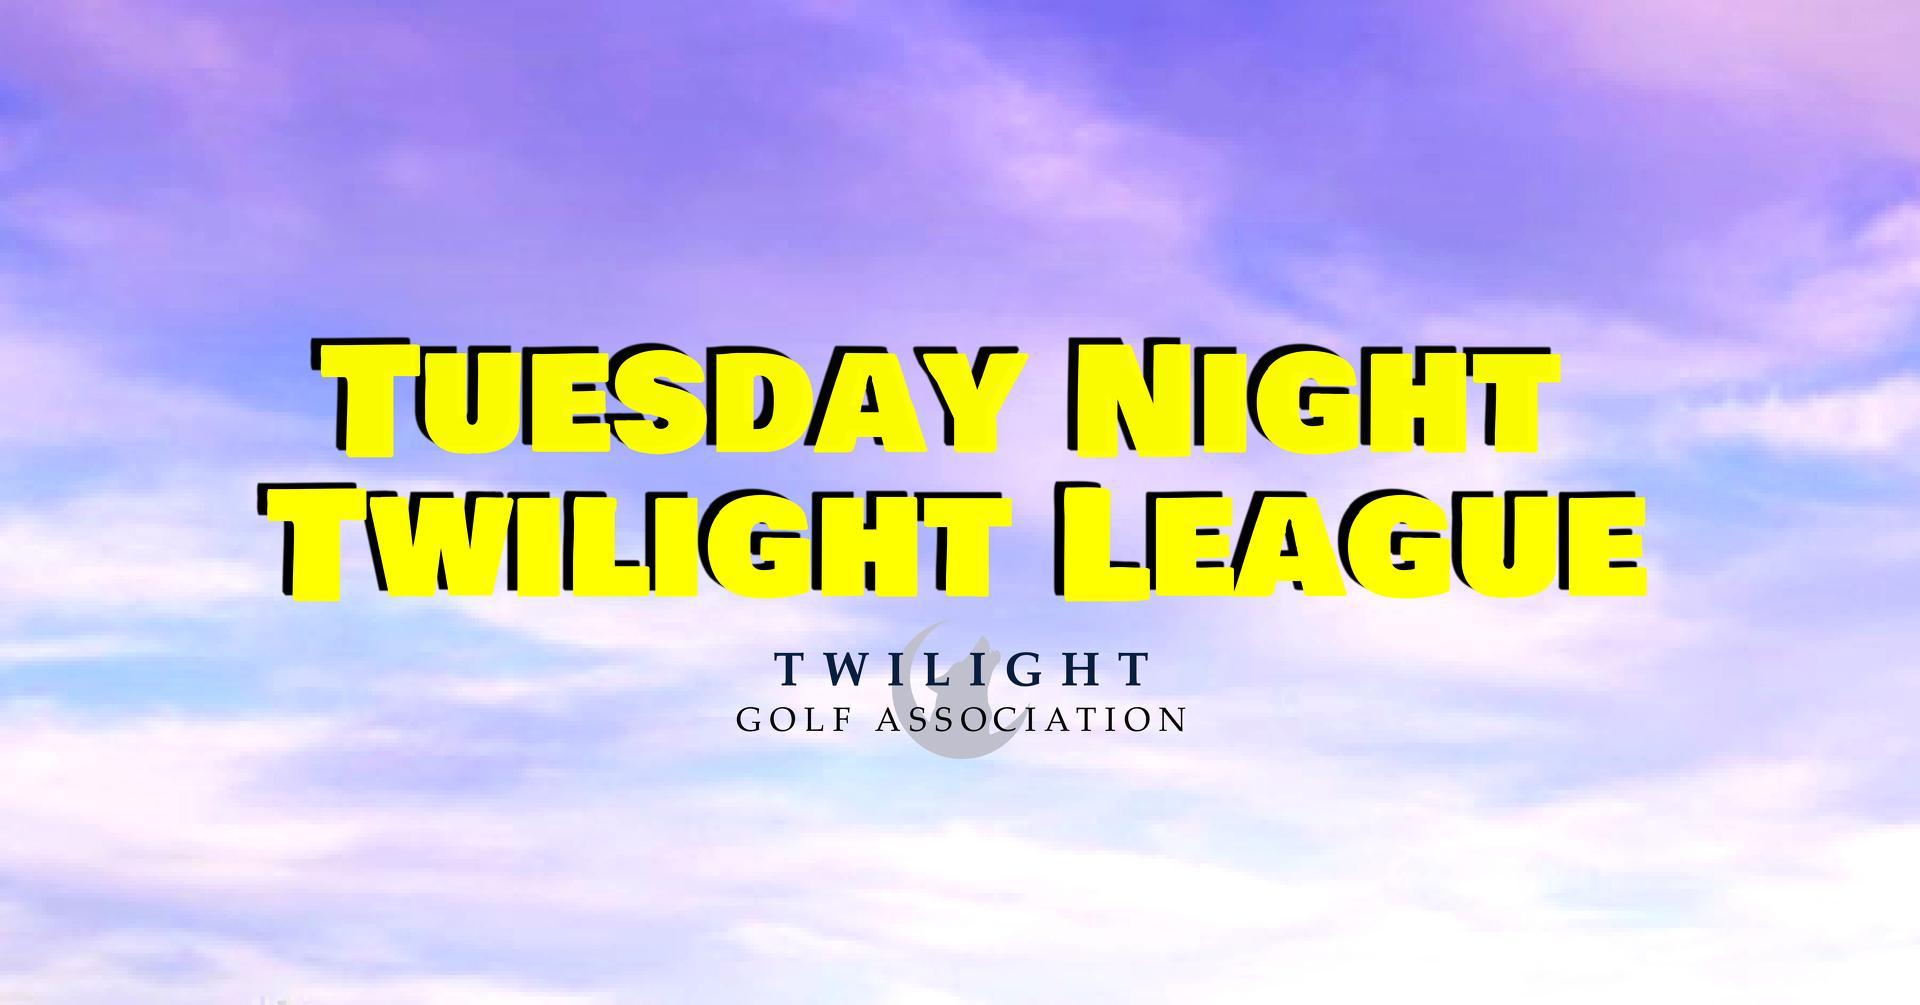 Tuesday Twilight league at Fellows Creek Golf Club